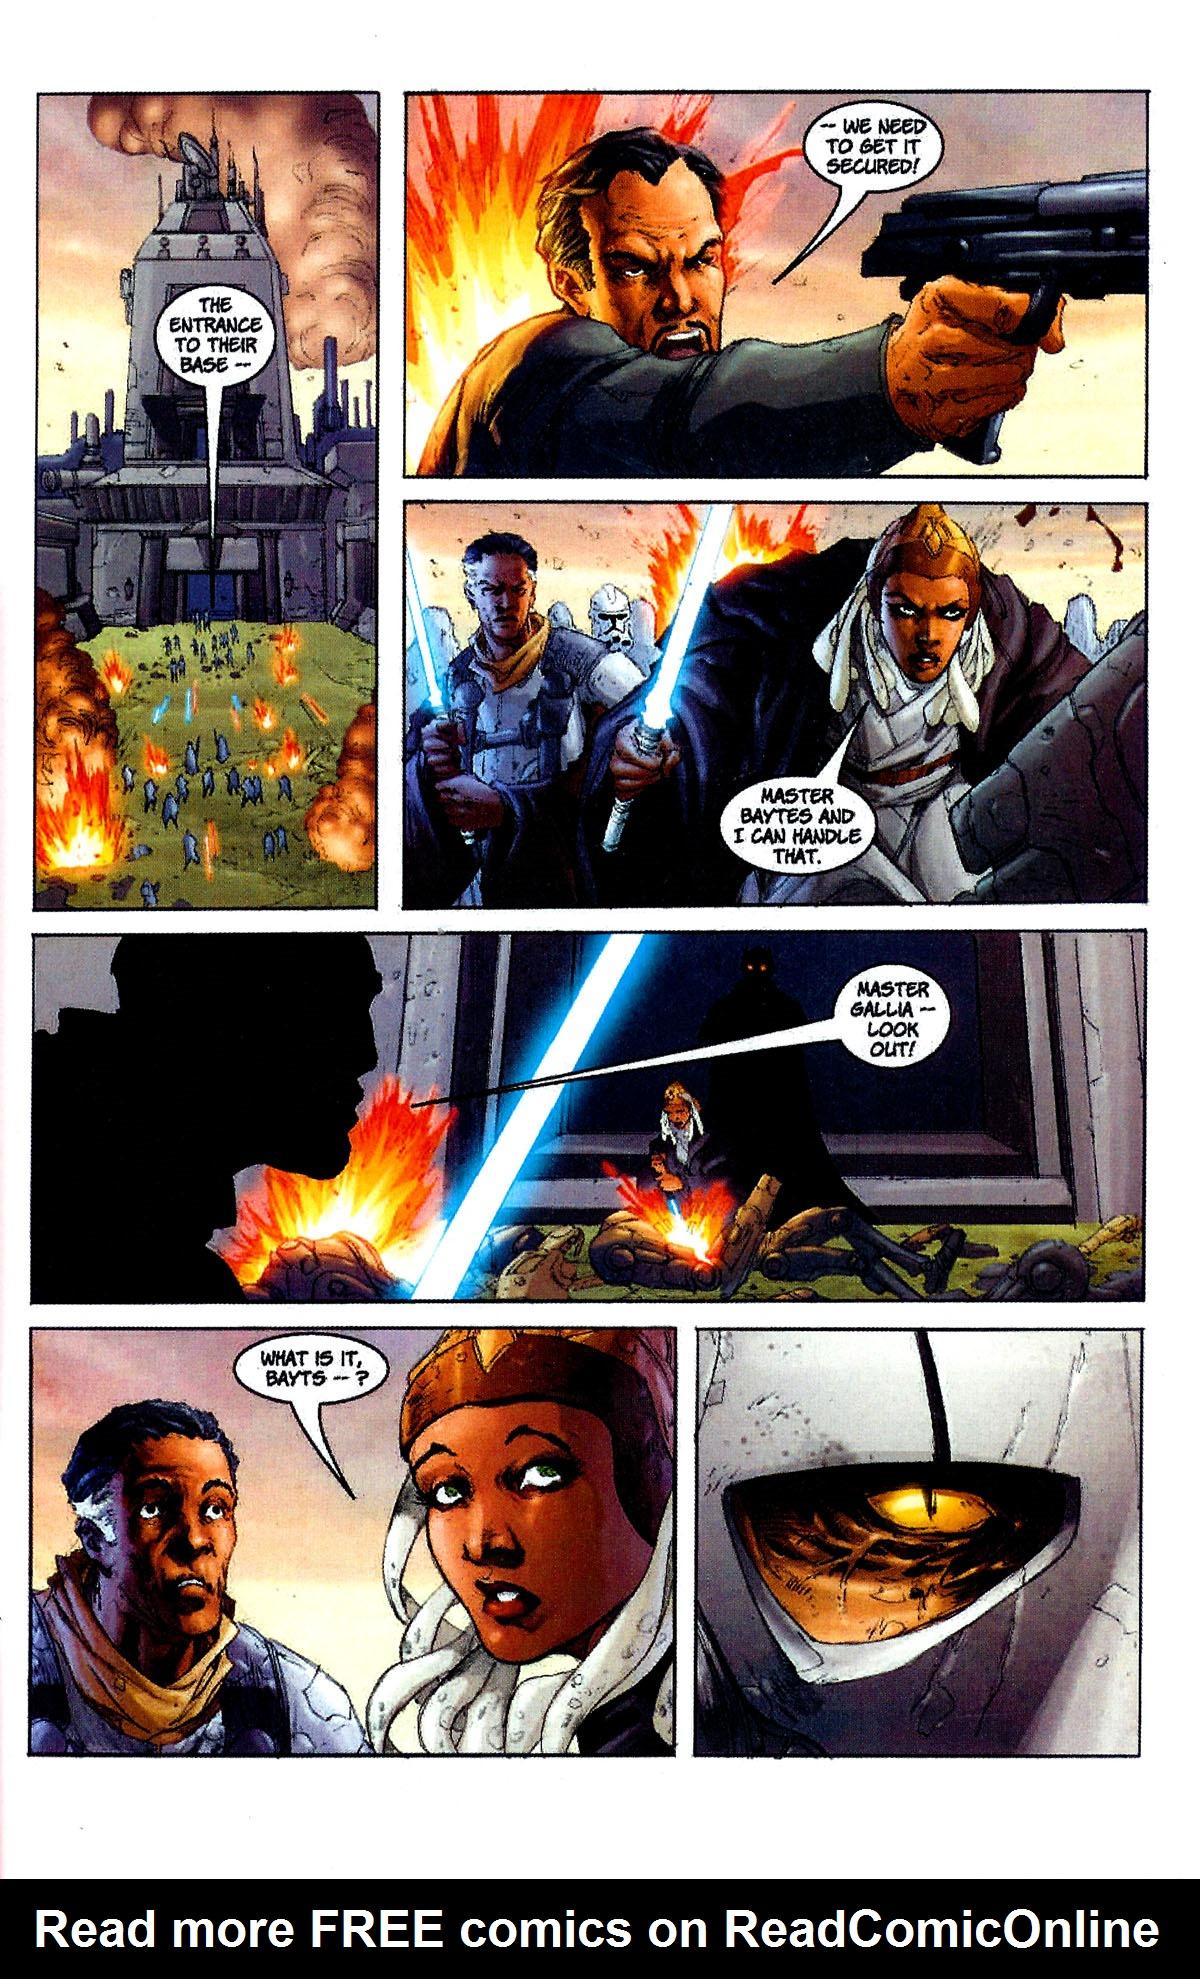 Star Wars: Obsession #4 #4 - English 19